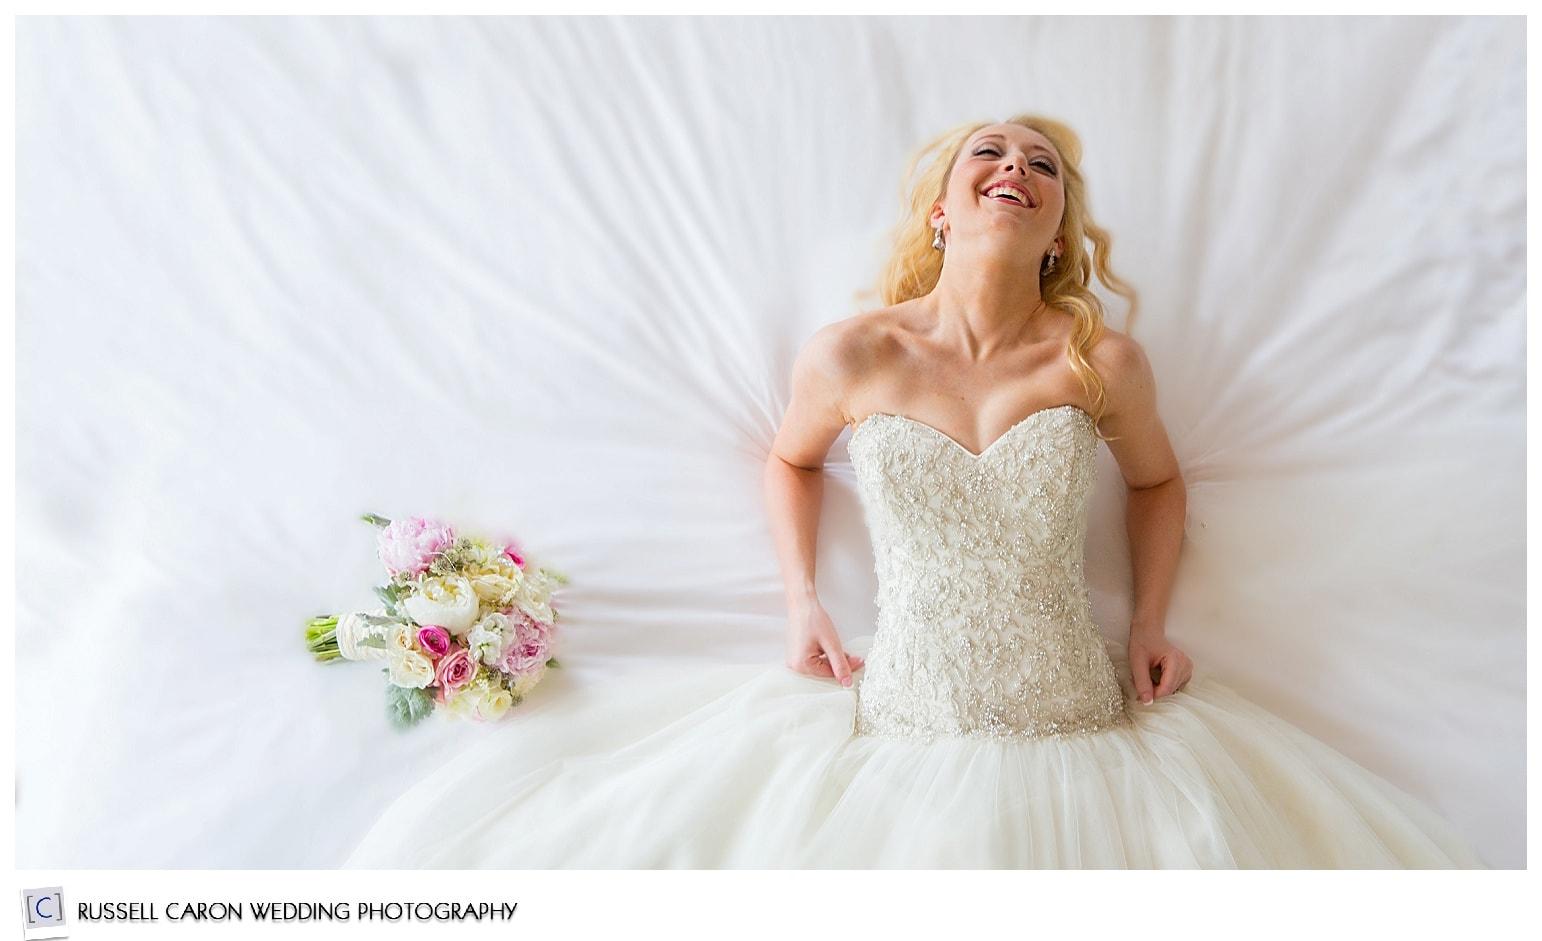 Bridal prep photo at the Norumbega Inn, Camden, Maine